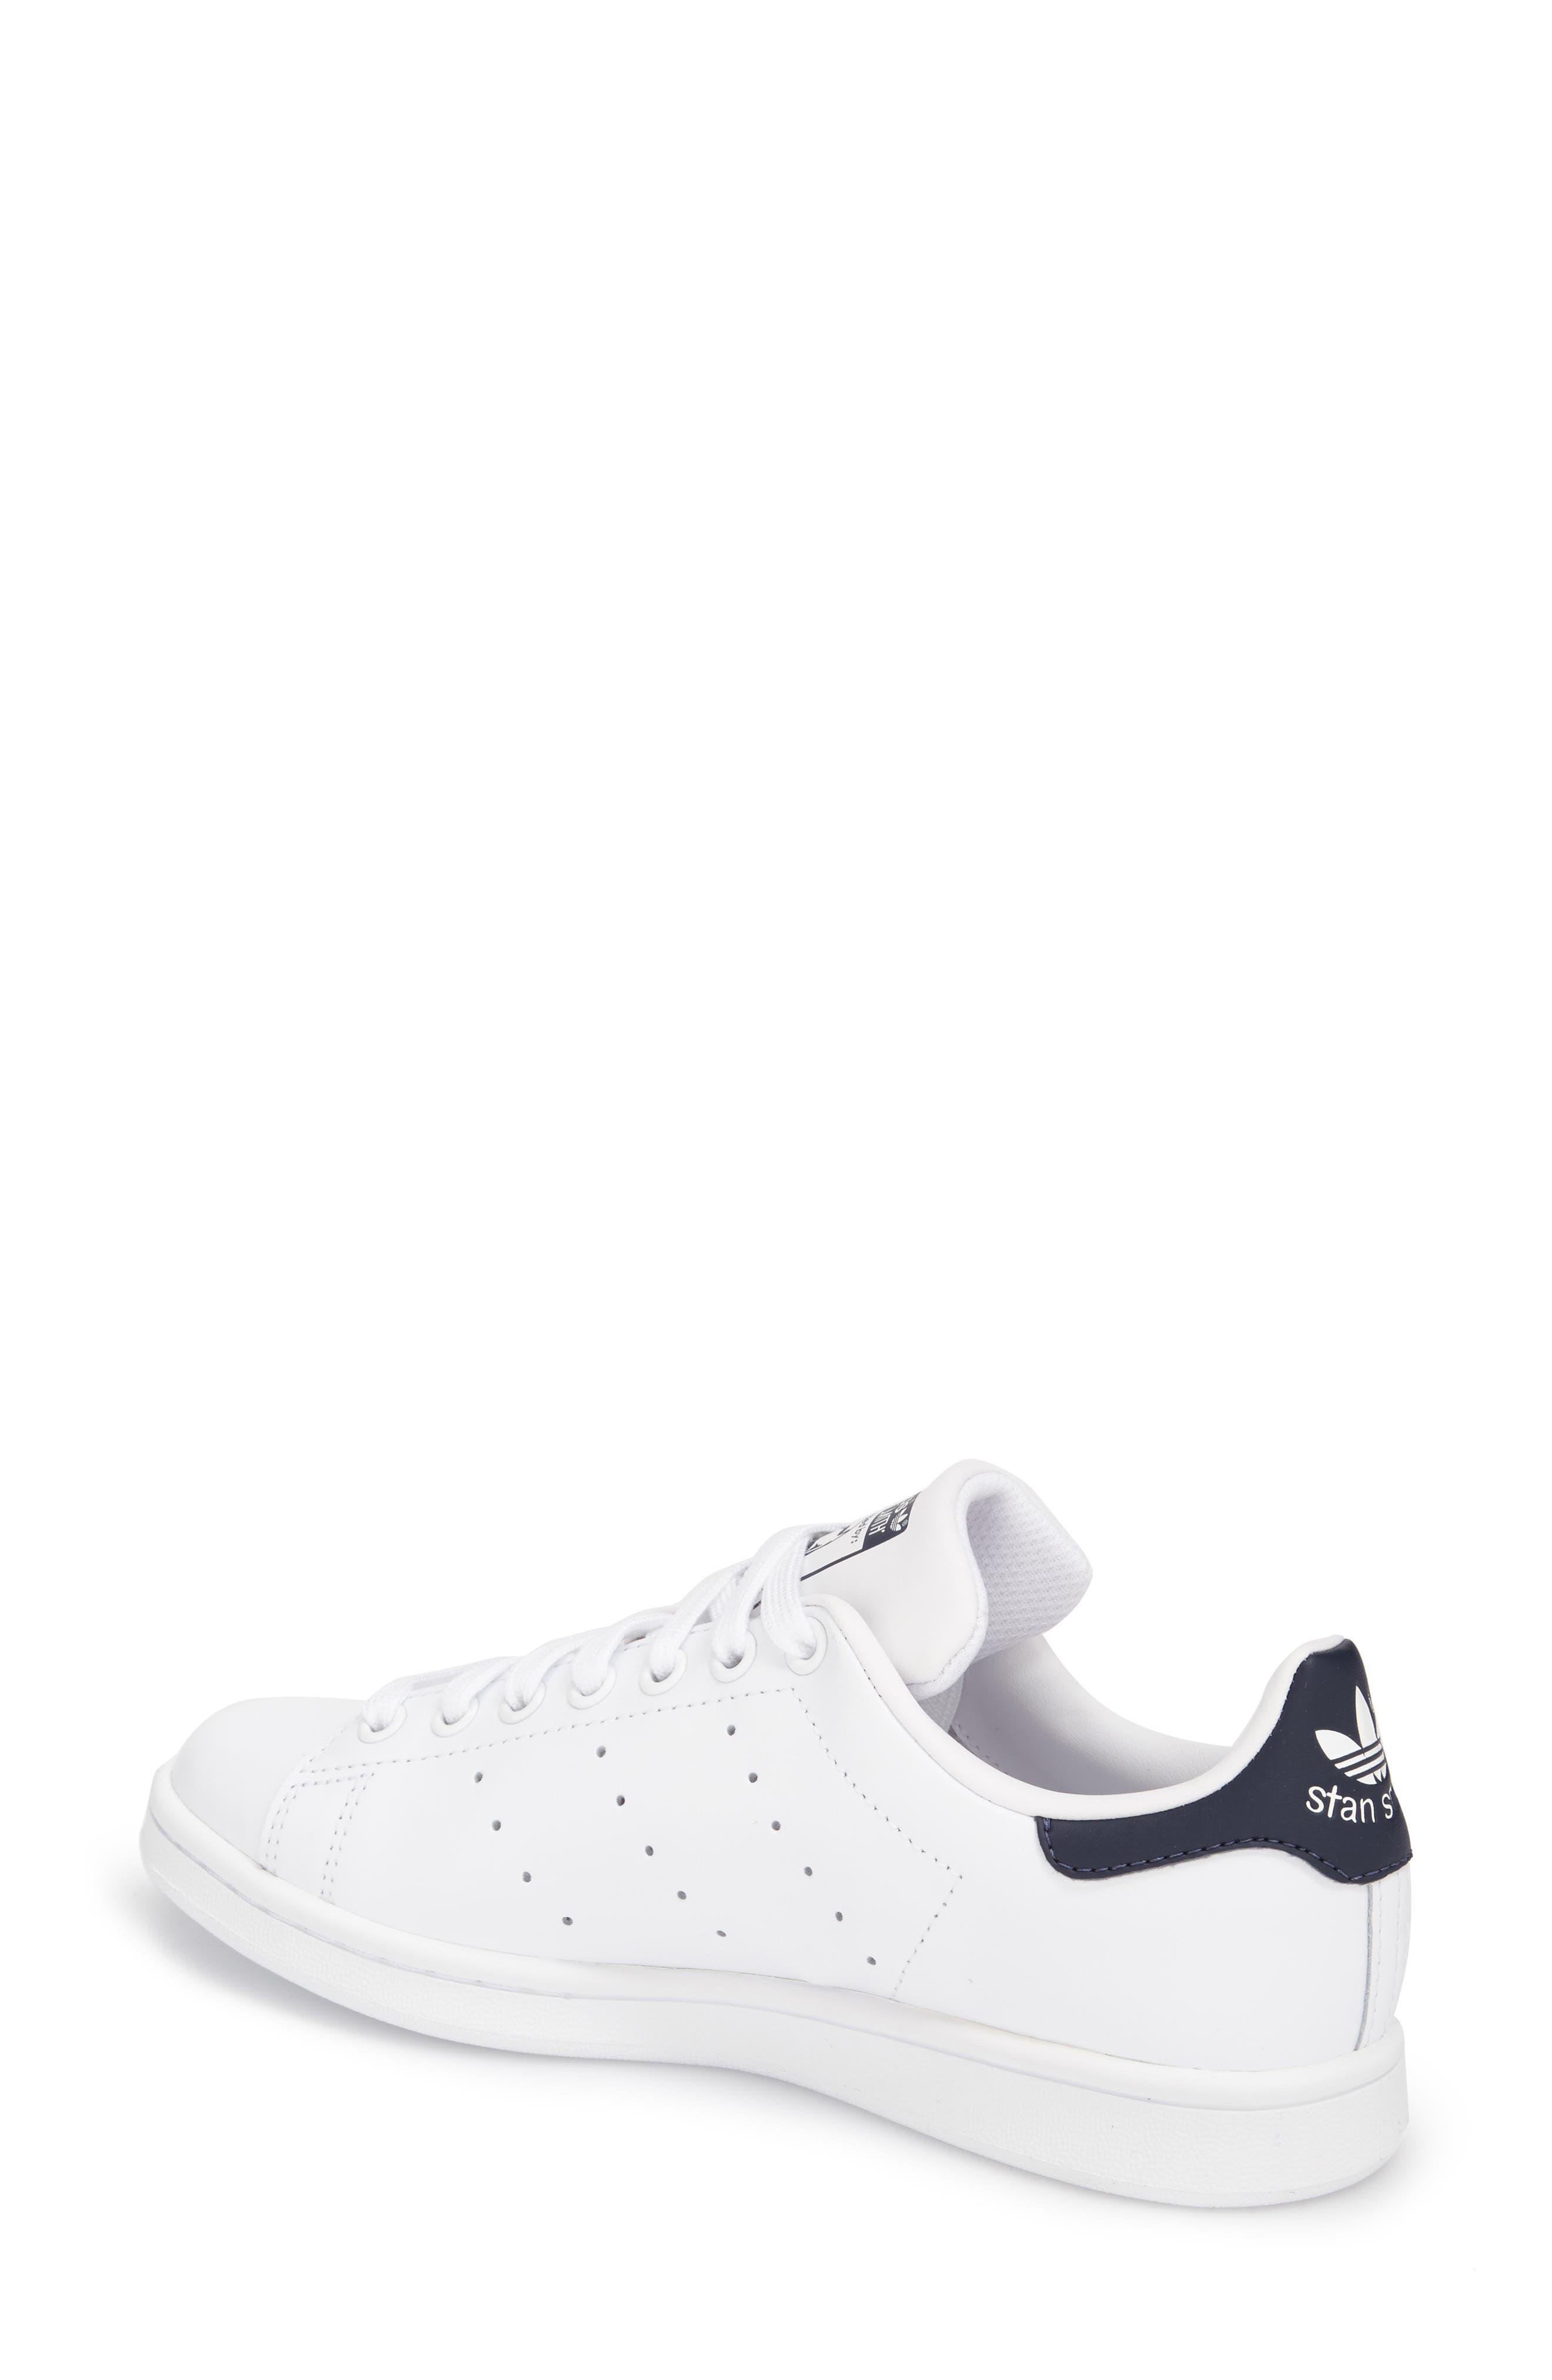 'Stan Smith' Sneaker,                             Alternate thumbnail 38, color,